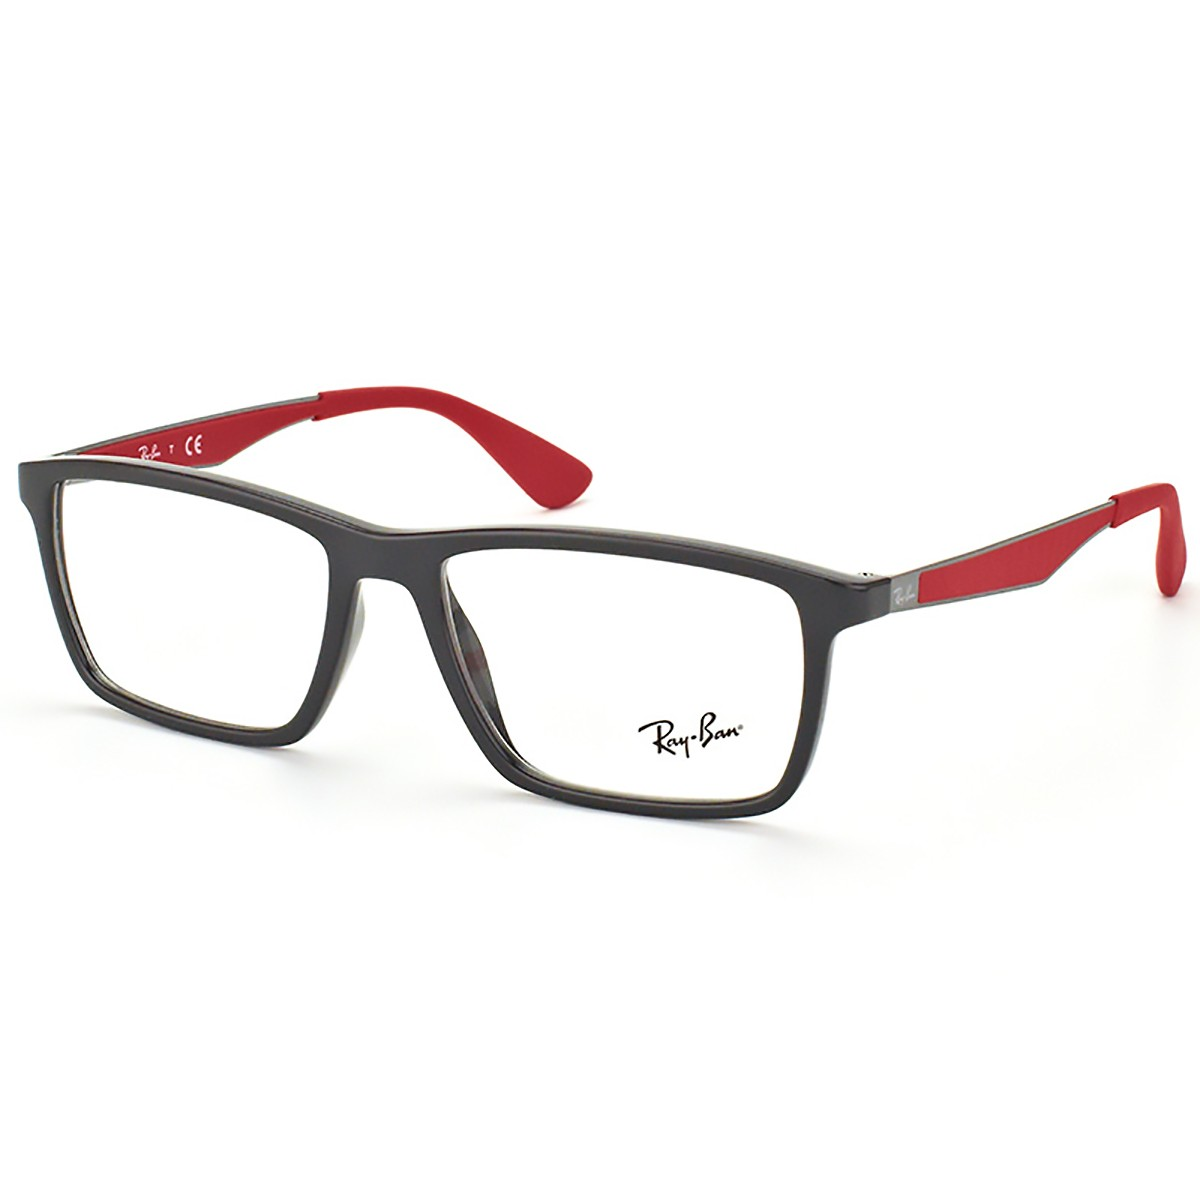 450bd9ee26ec8 Compre Óculos de Grau Ray Ban em 10X   Tri-Jóia Shop